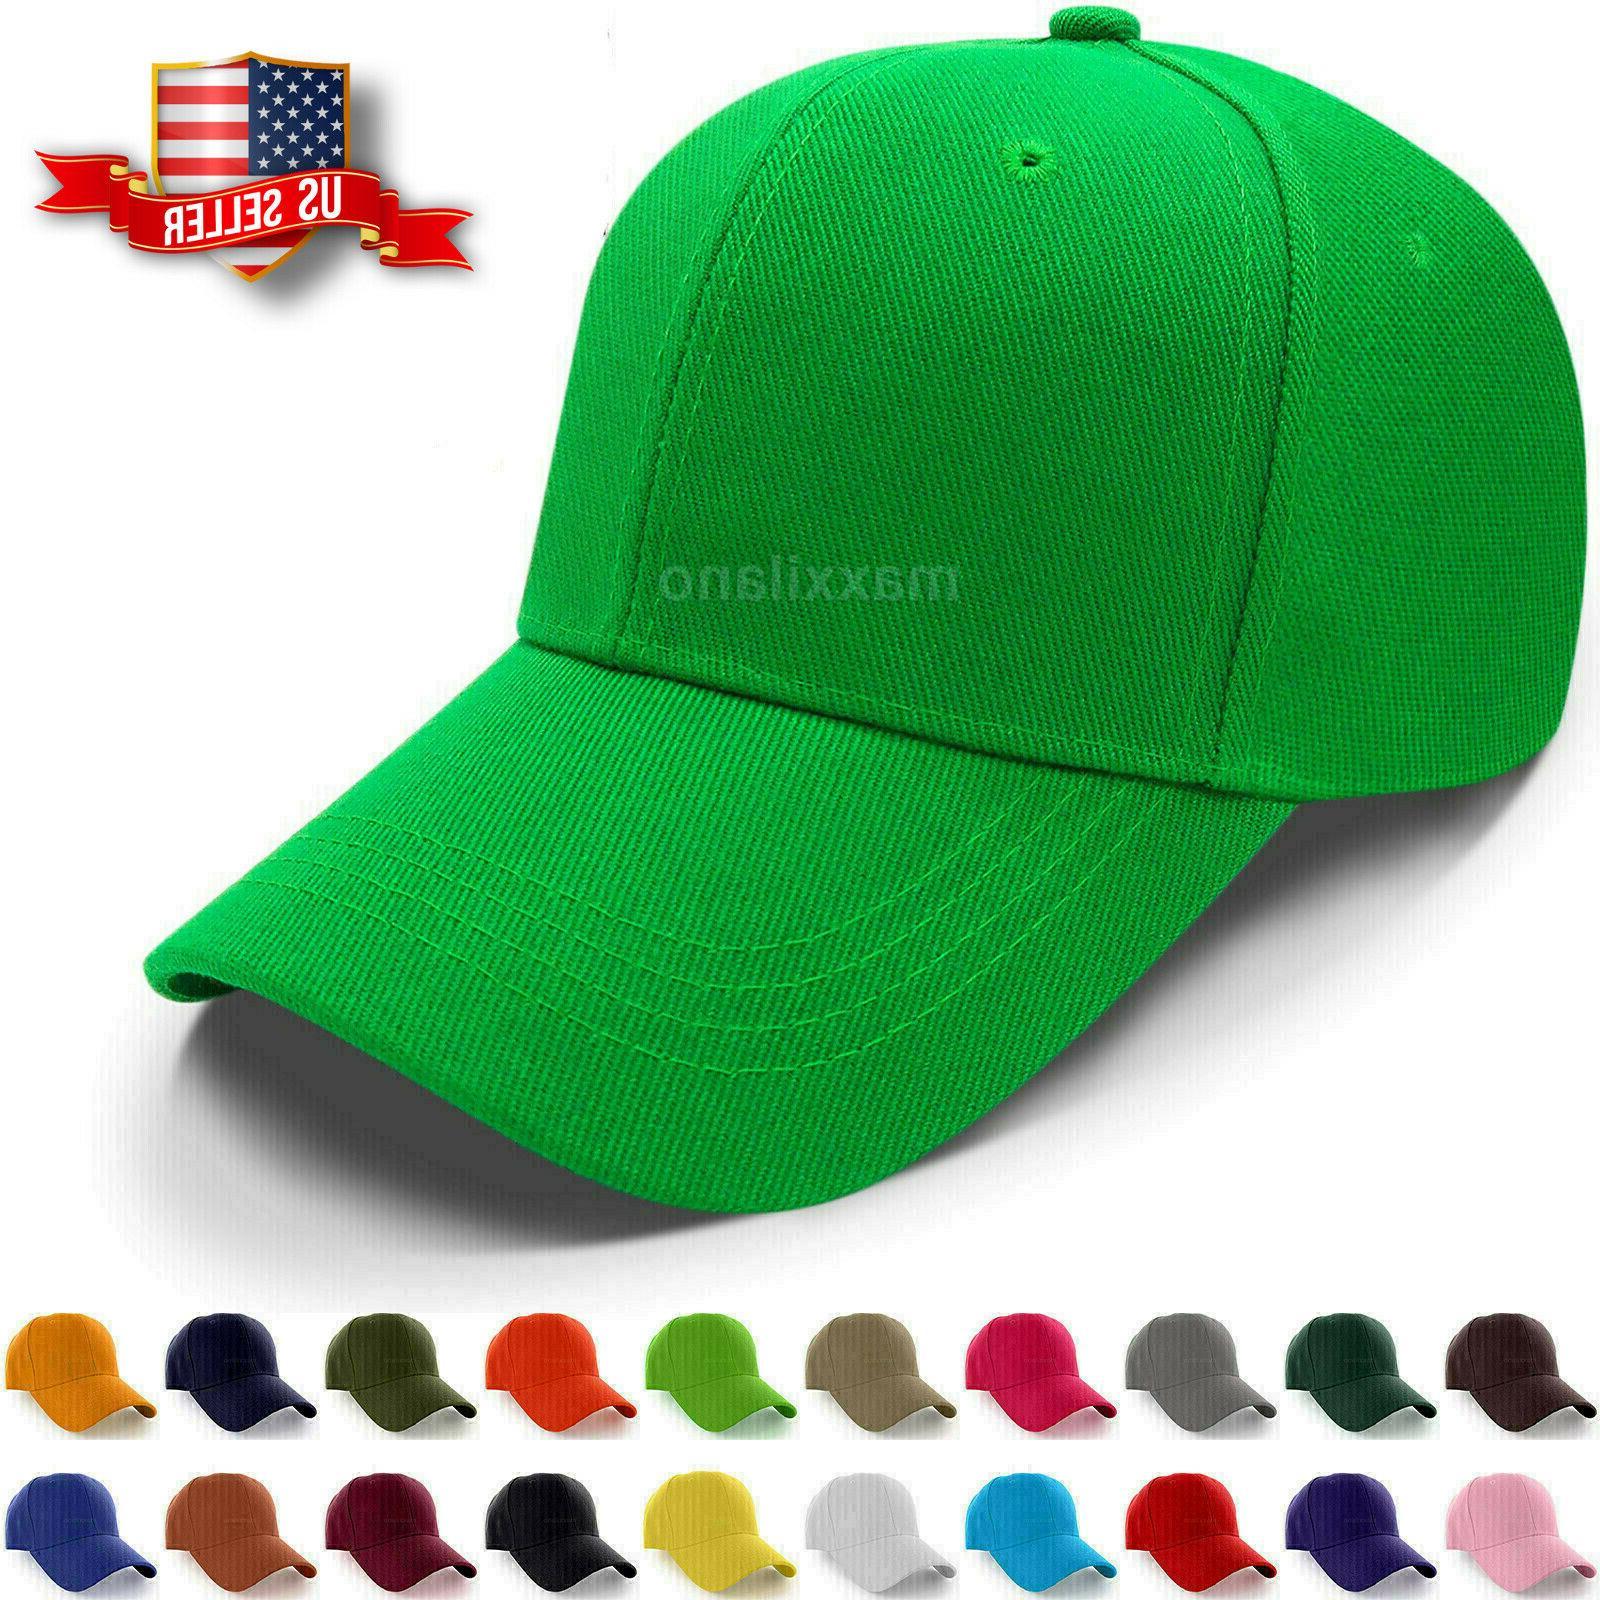 baseball caps plain loop adjustable solid color